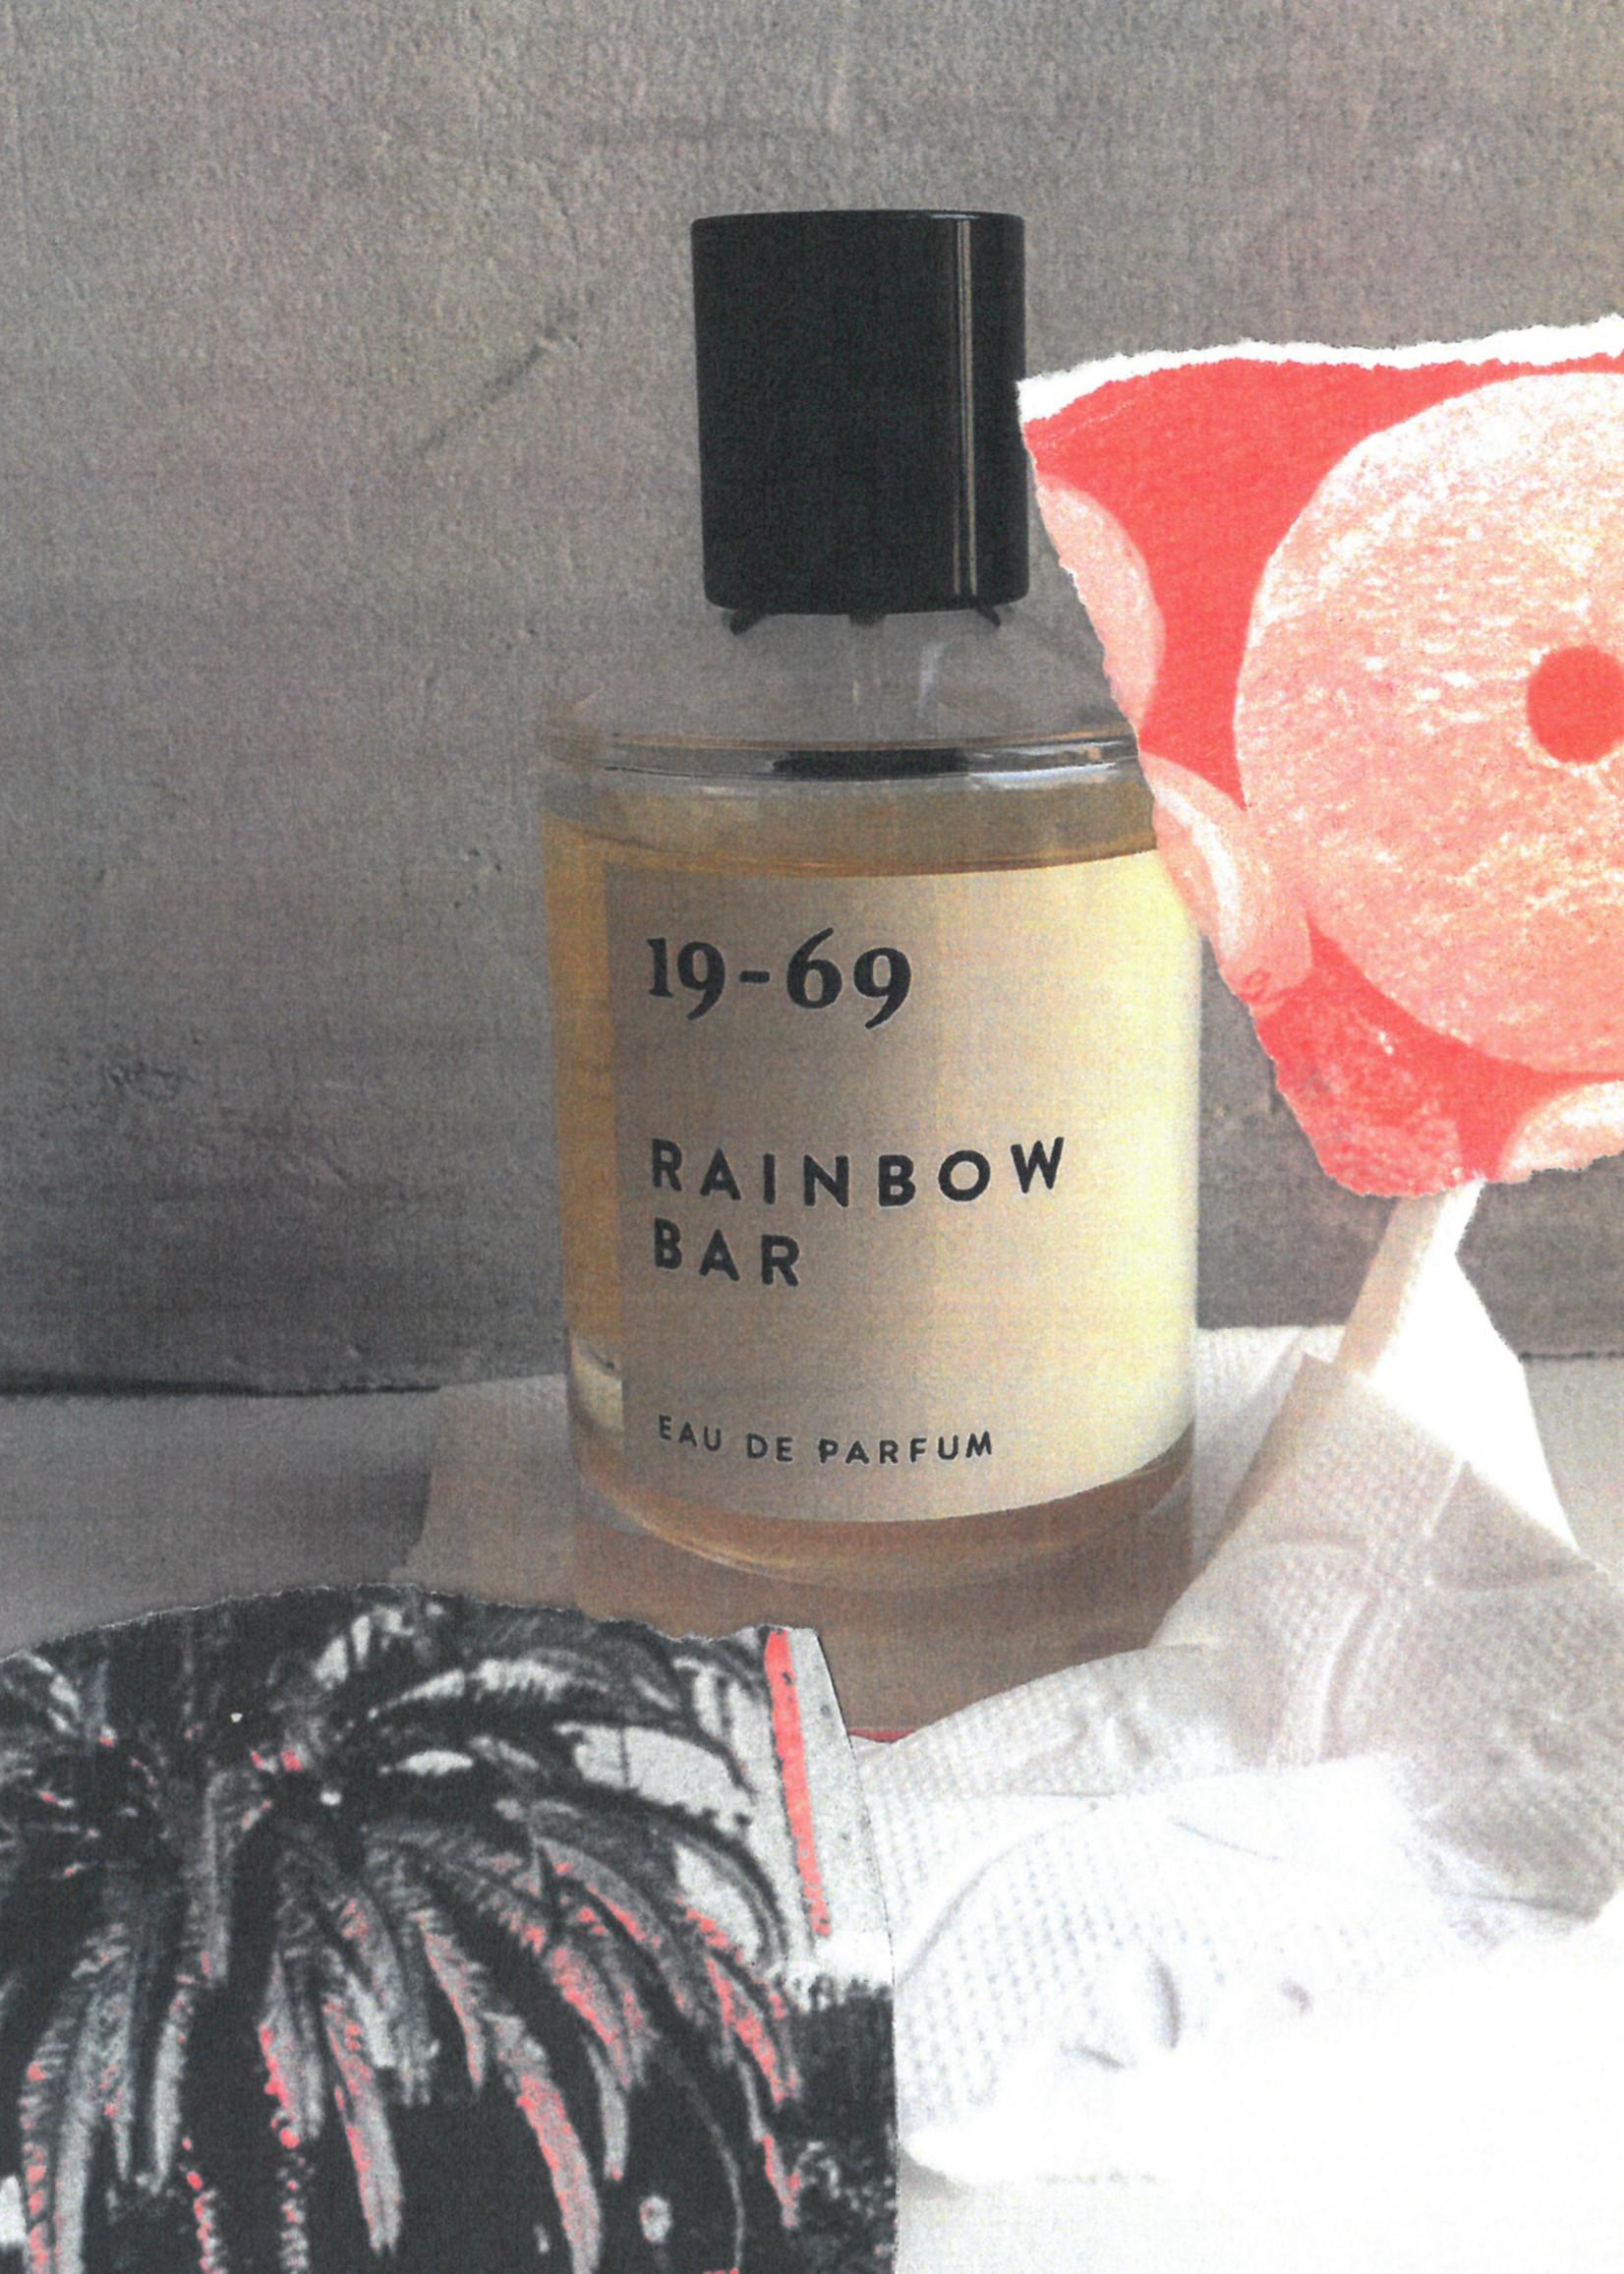 Nineteen Sixty Nine Nineteen sixty nine - Rainbow bar - Eau de Parfum